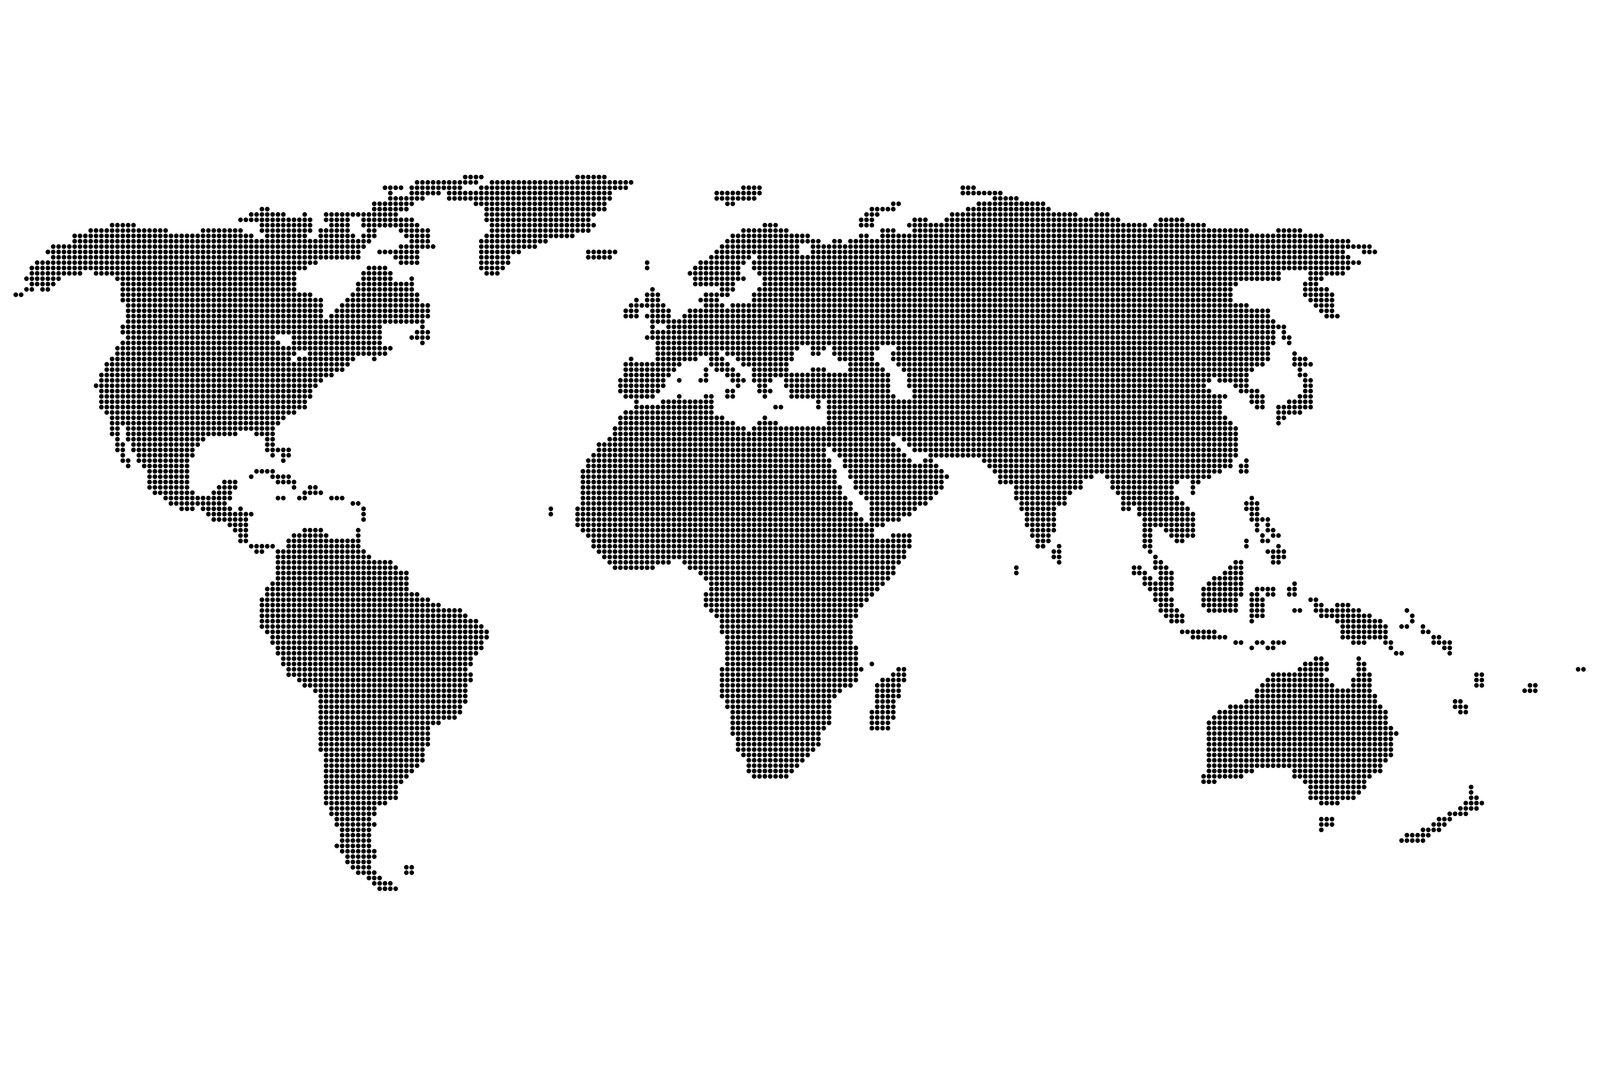 Dot World Map.Free Dot World Map Stock Photo Freeimages Com